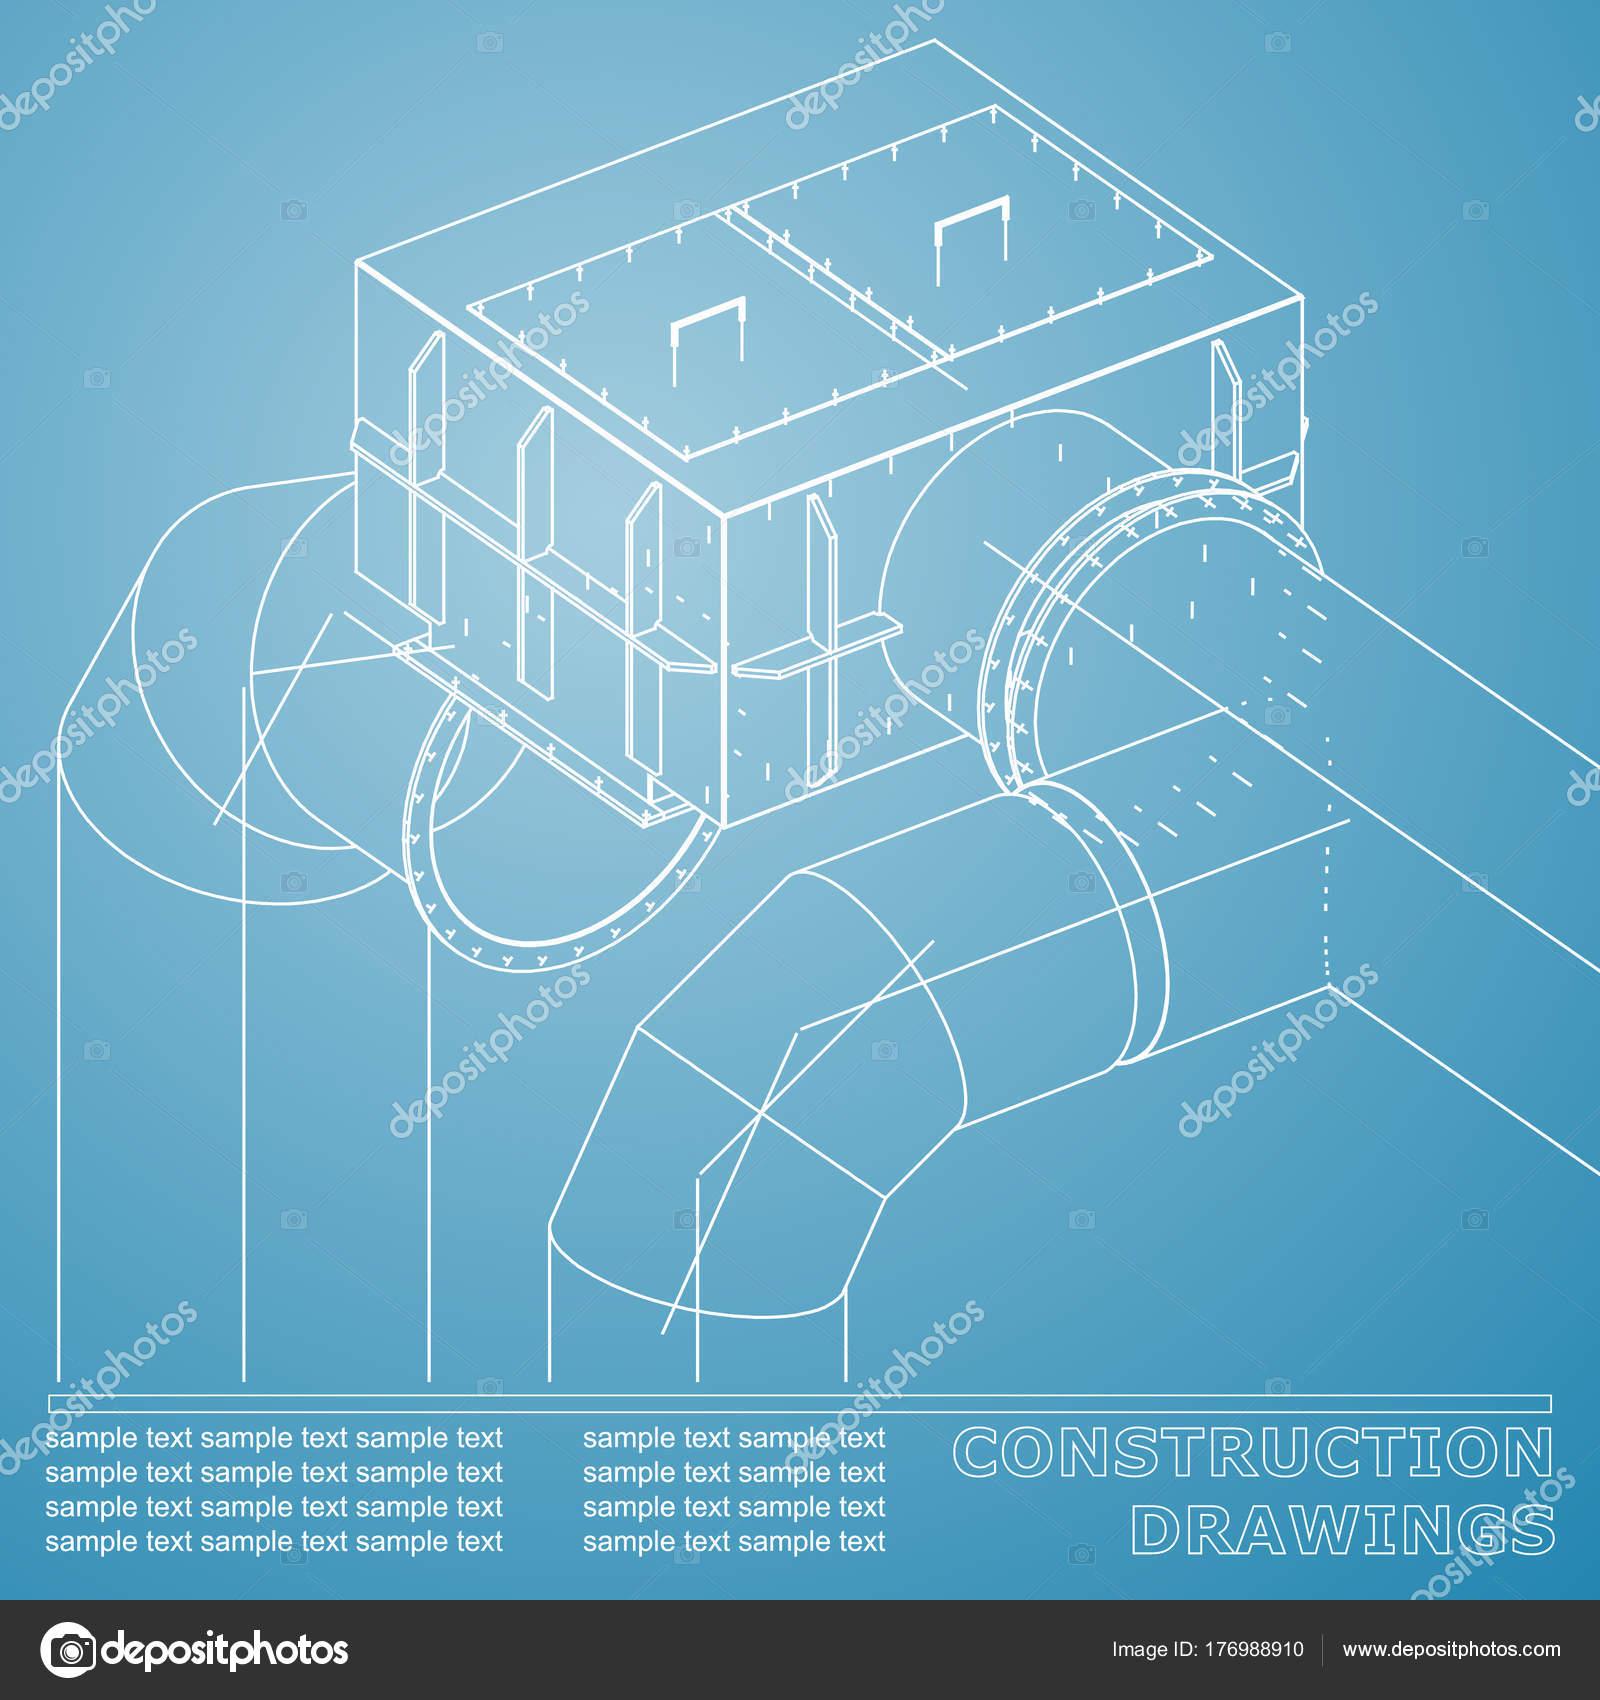 Dibujos estructuras acero tubos tuberas blueprint estructuras acero dibujos estructuras acero tubos tuberas blueprint estructuras acero azul blanco vector de stock malvernweather Choice Image